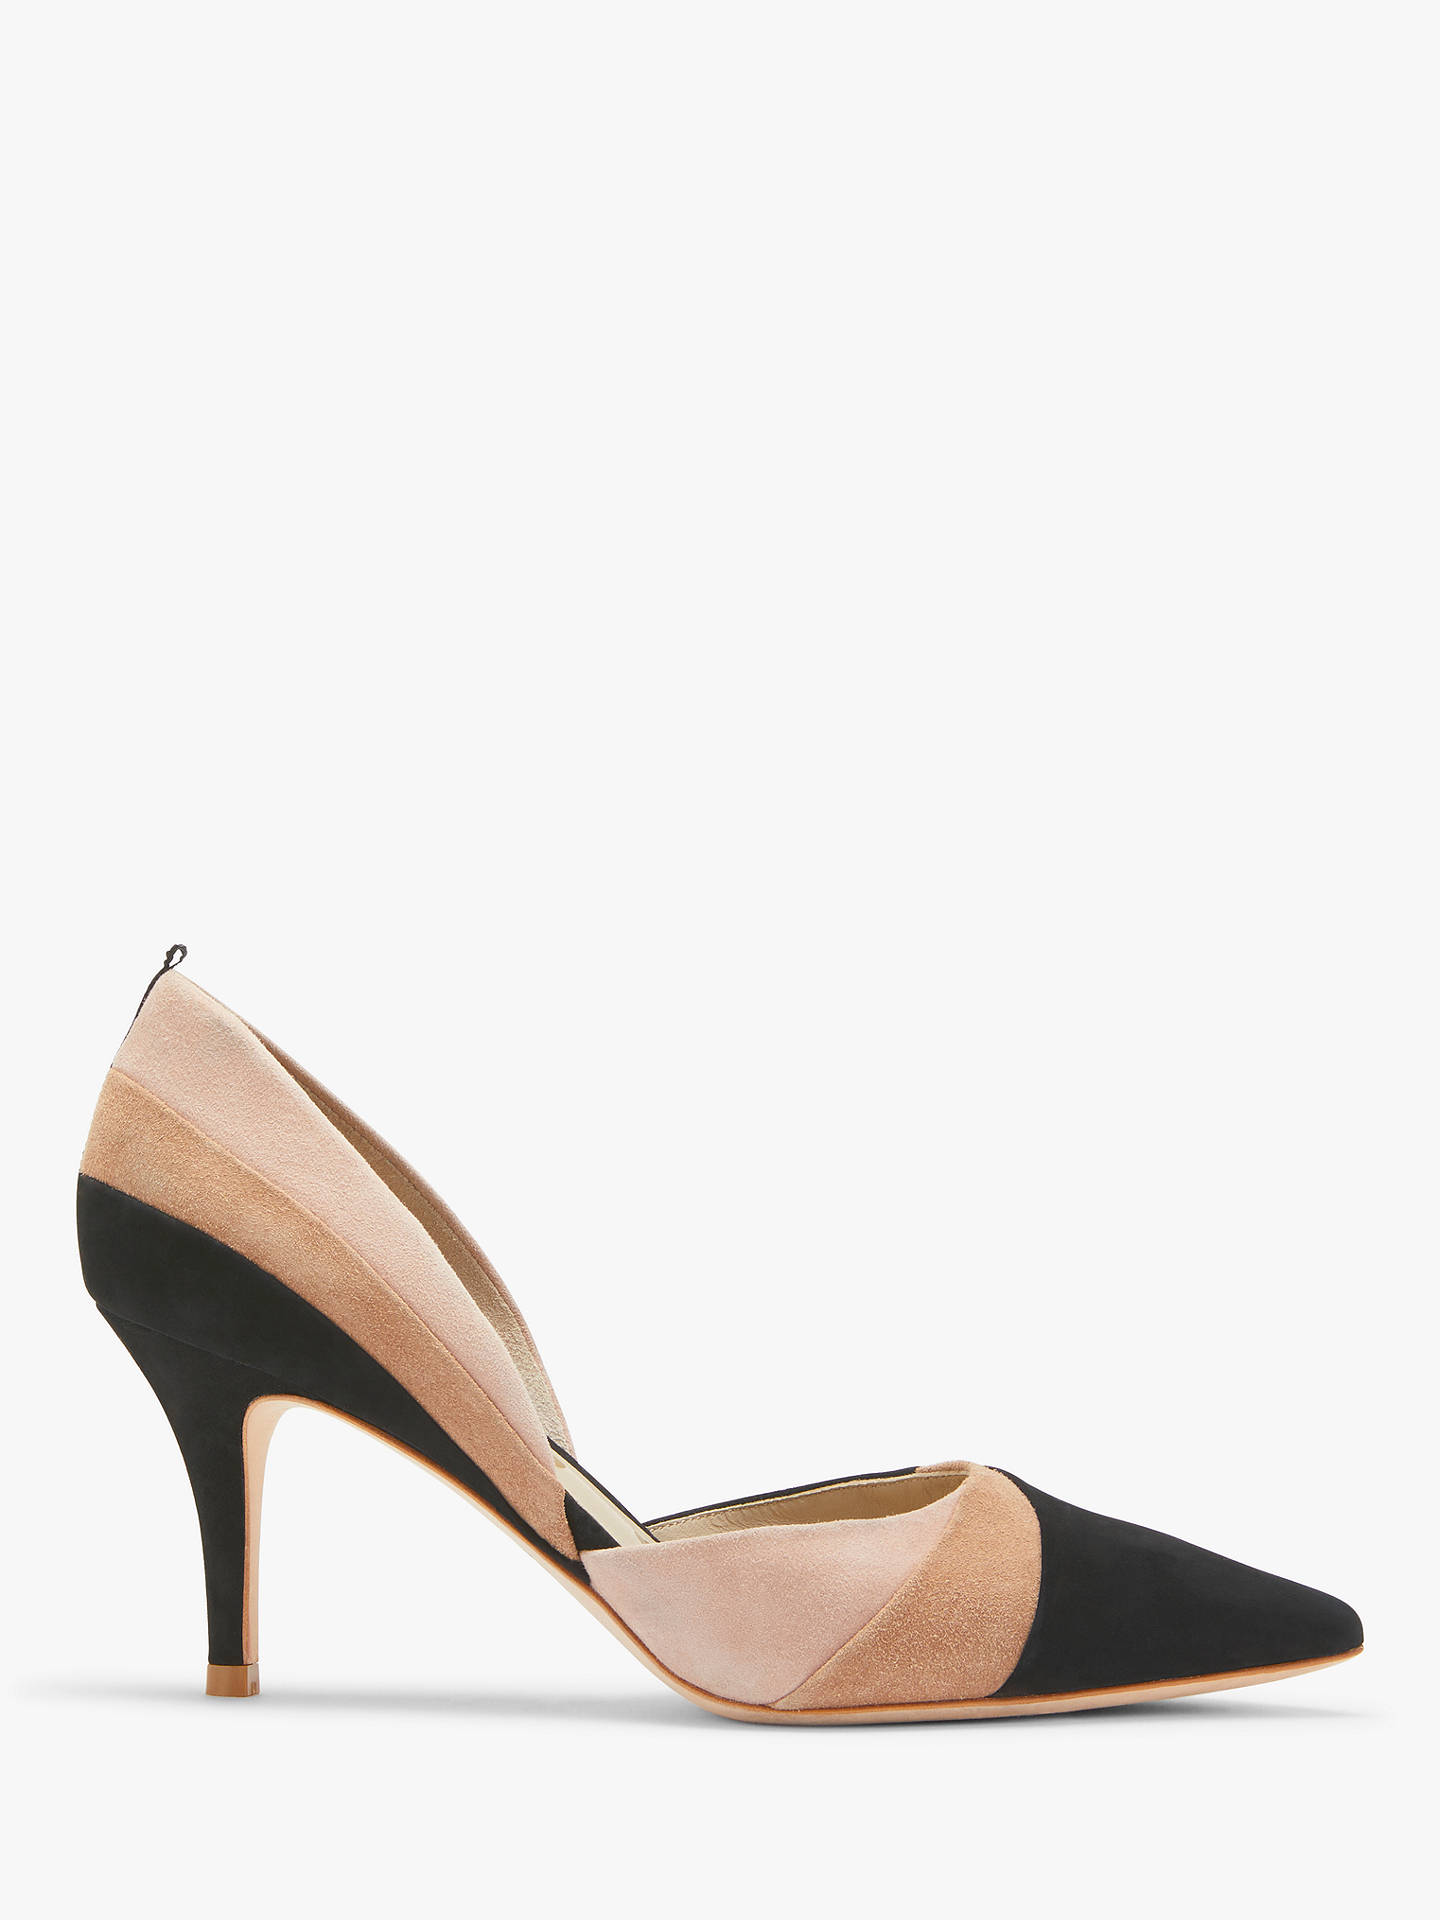 76e31a1f81f4 Buy Boden Henrietta Block Colour Court Shoes